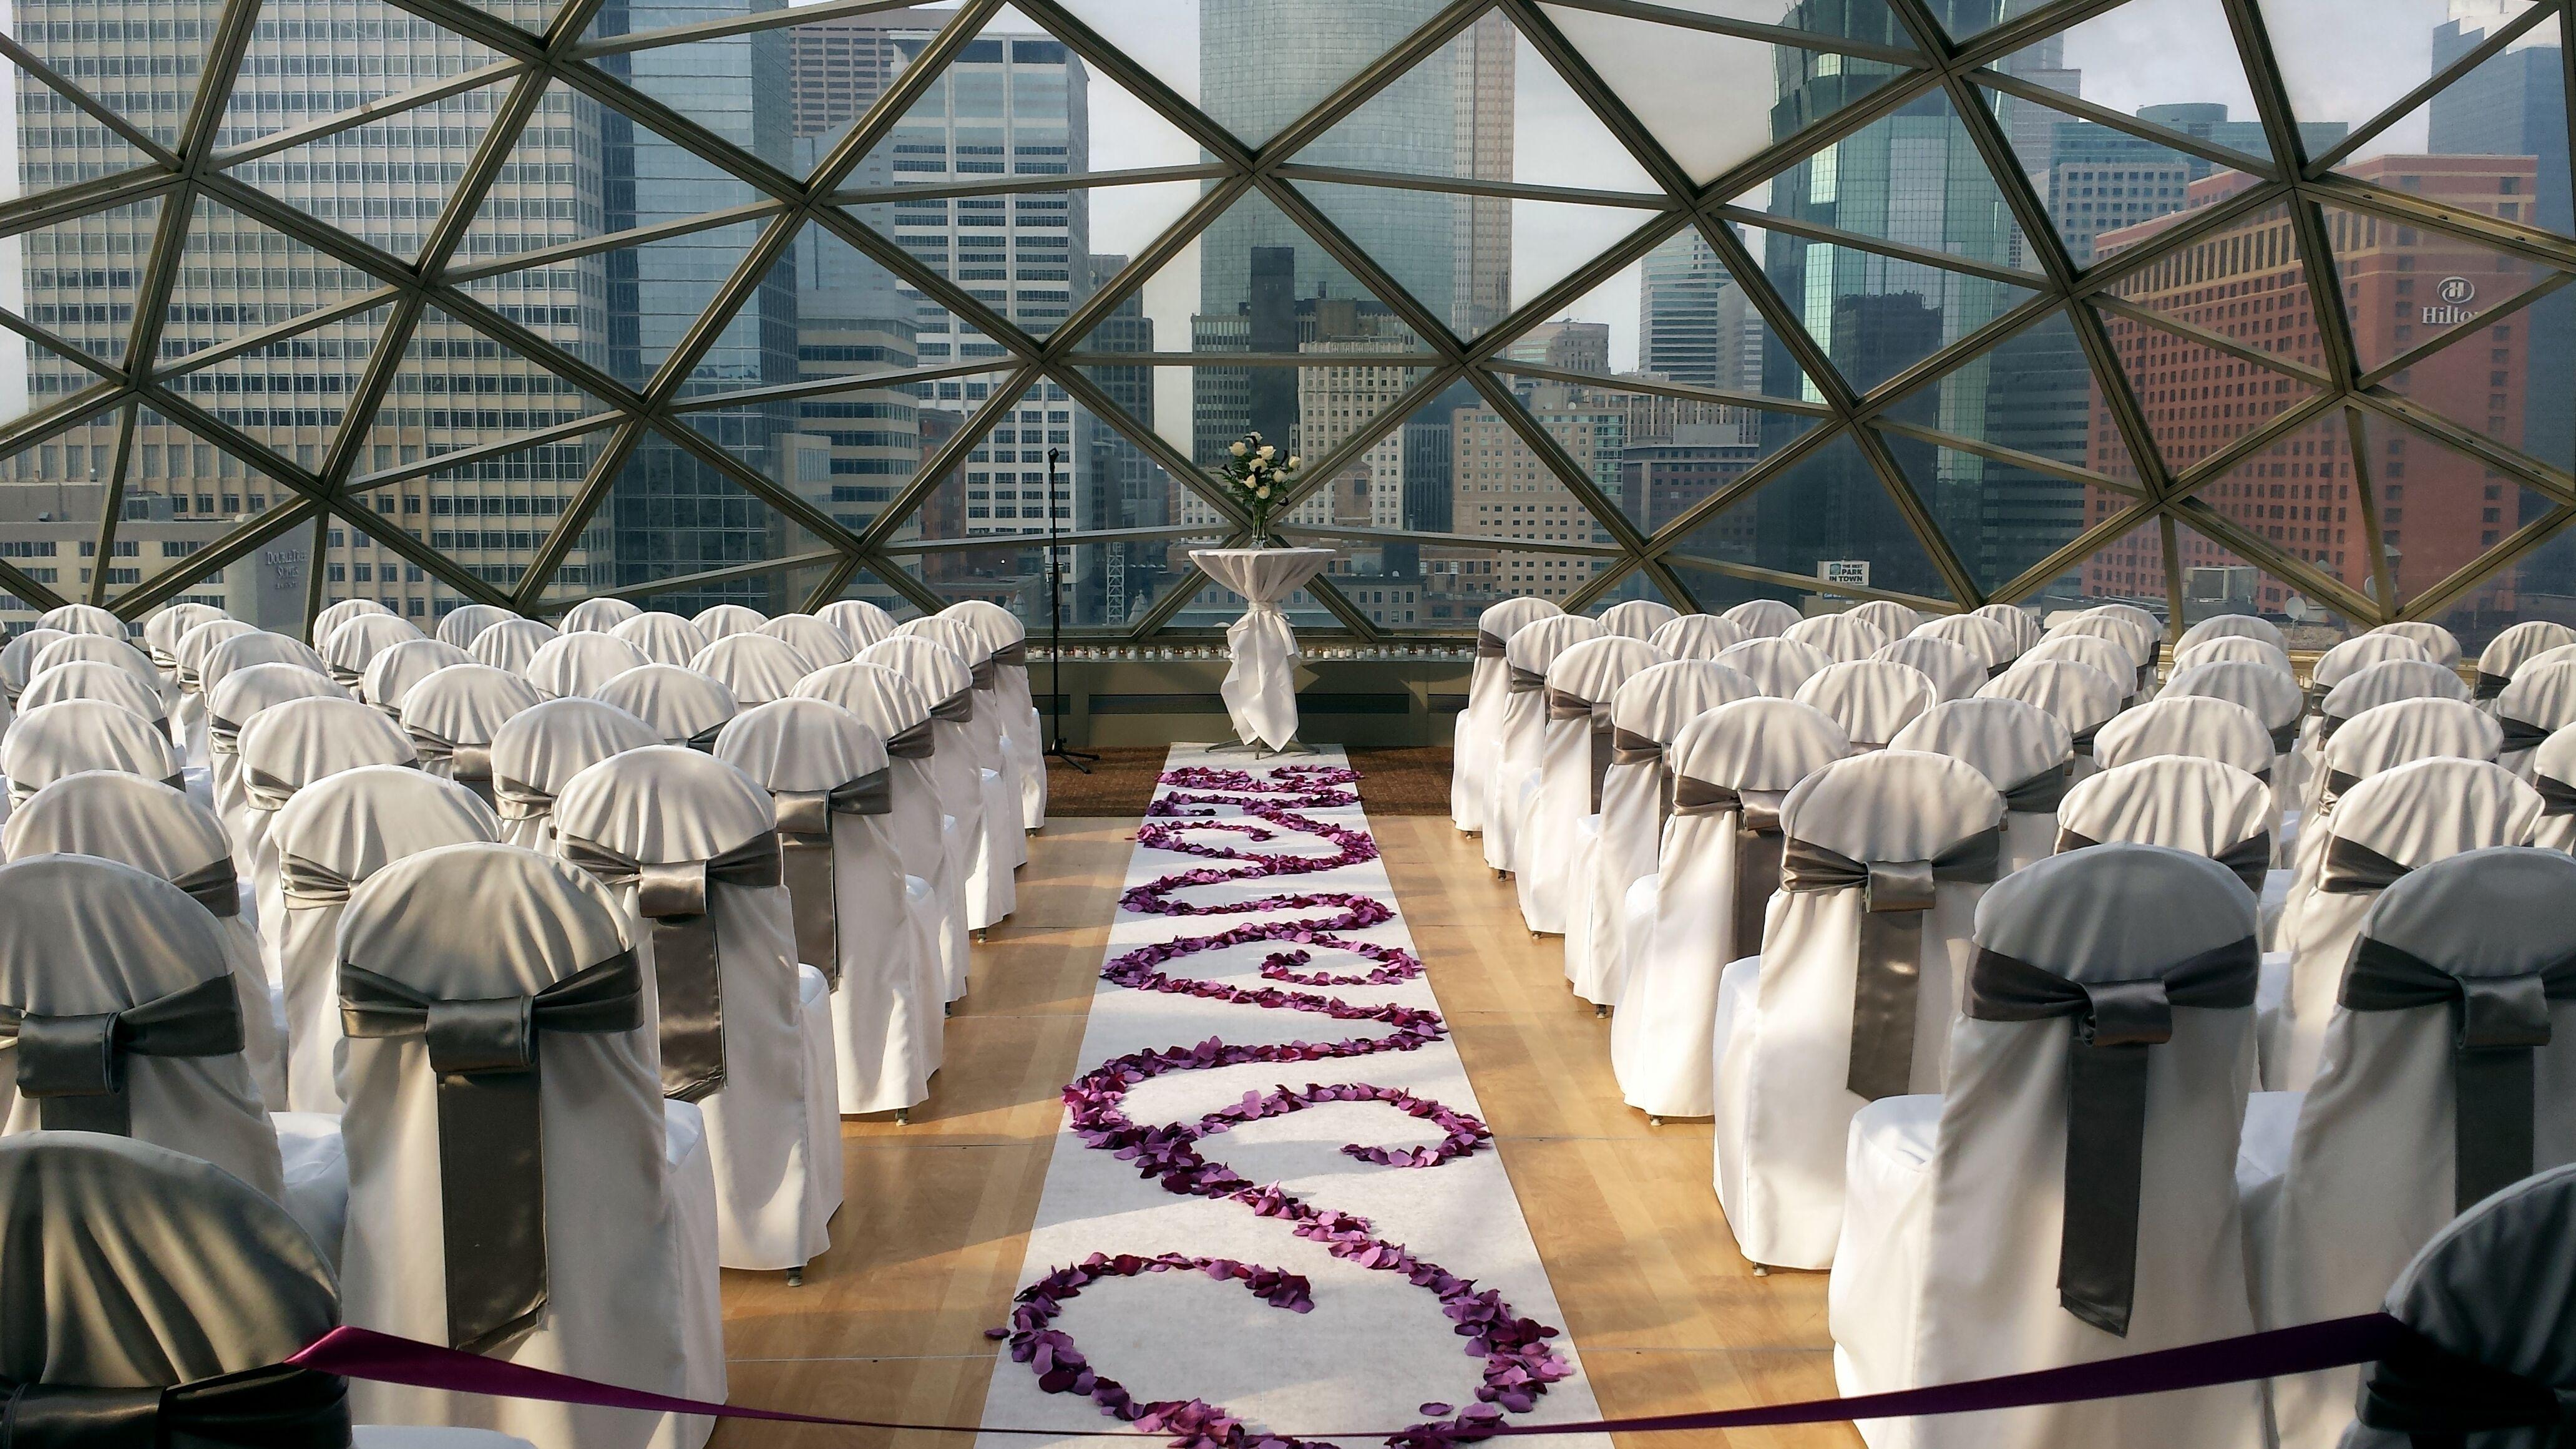 Minnesota Wedding Ceremony Locations: Millennium Hotel Minneapolis